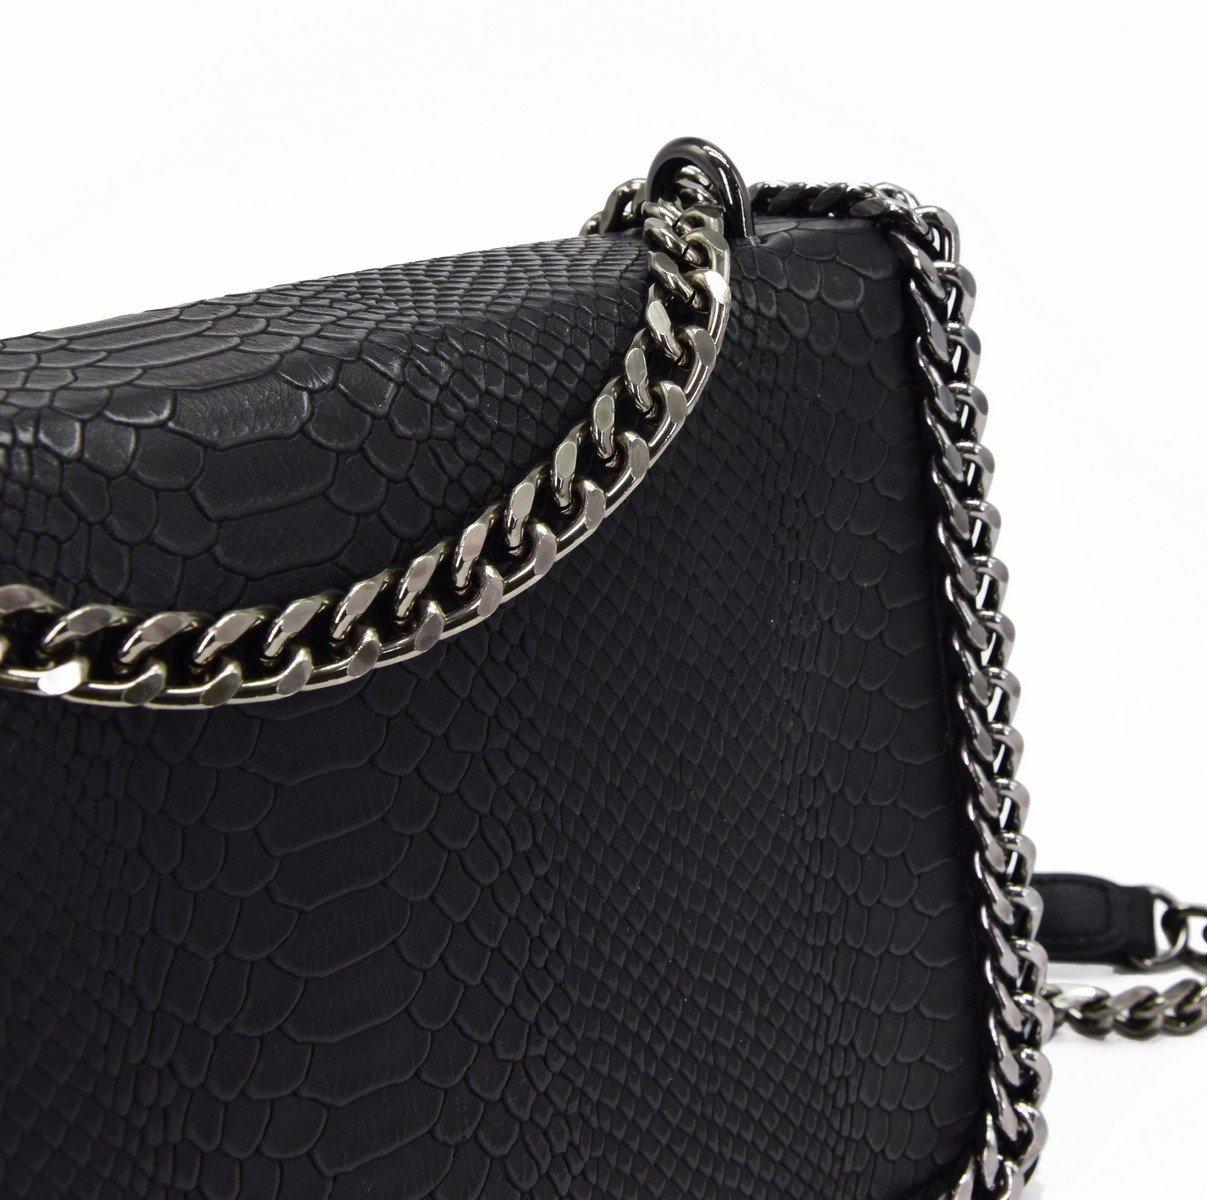 6f72b20c0 CRAZYCHIC - Women's Chain Quilted Crossbody Bag - Snake Skin PU Leather  Shoulder Handbag - Clutch Purse - Black: Amazon.co.uk: Luggage